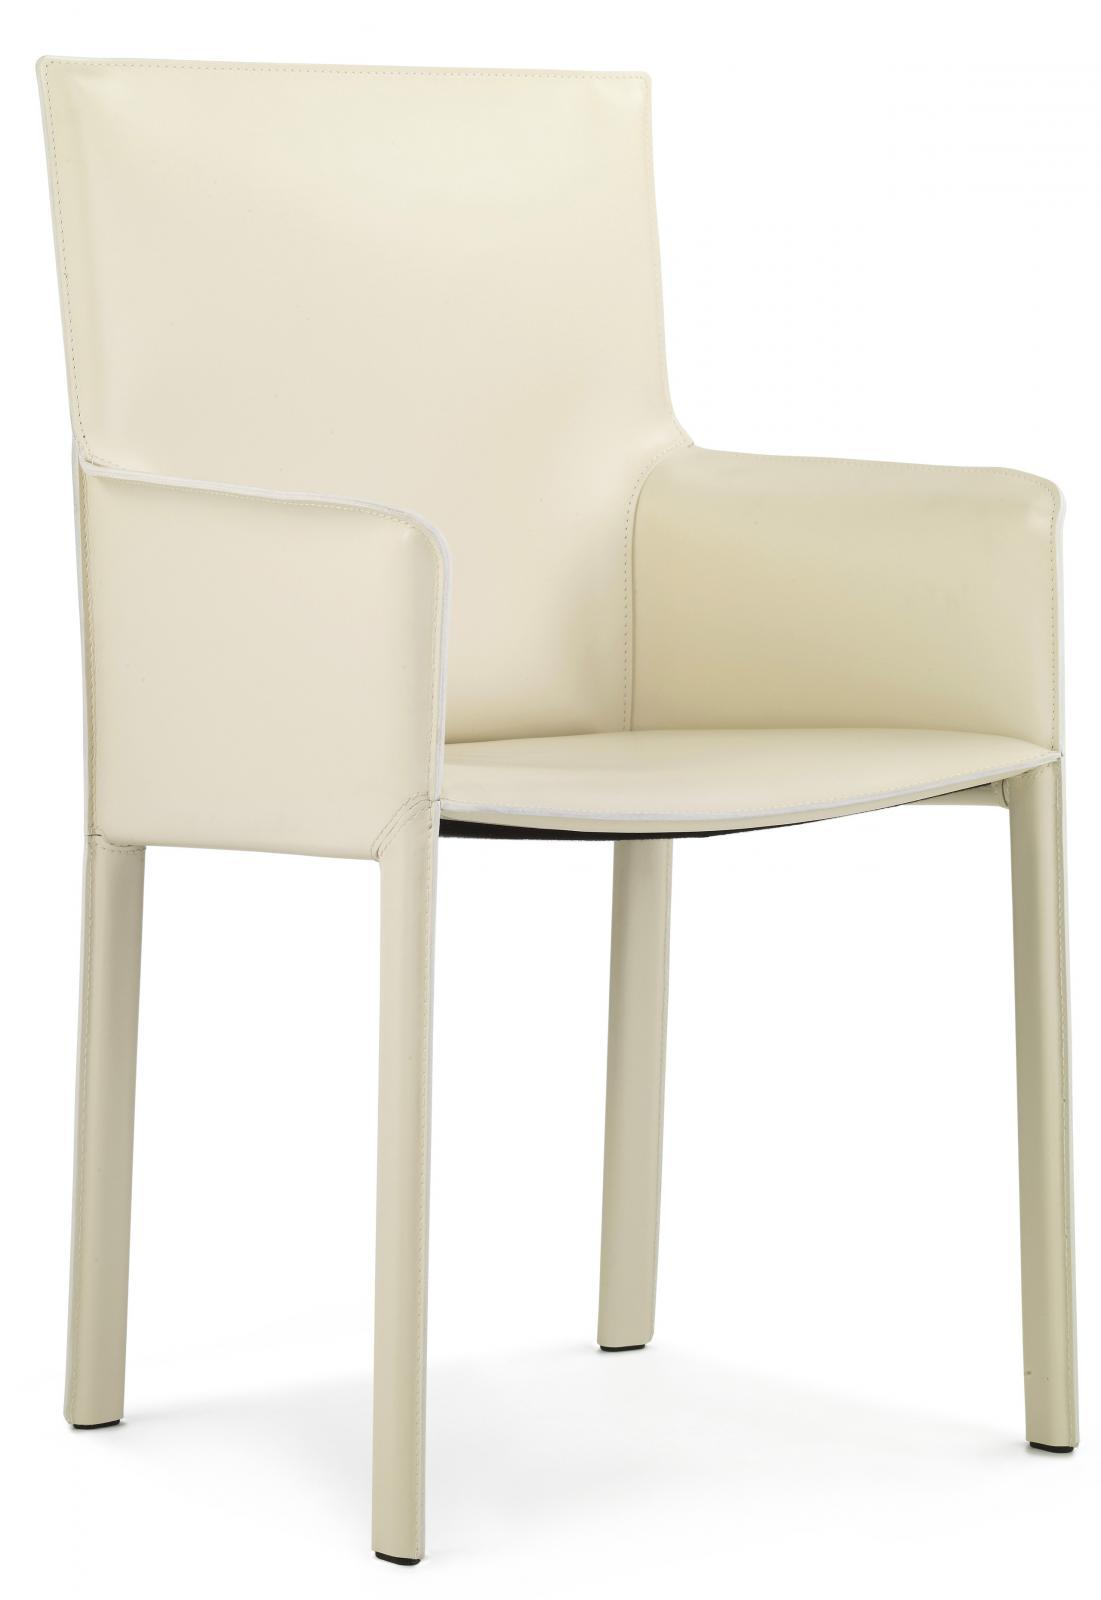 MDC 114 Modern Dining Chairs